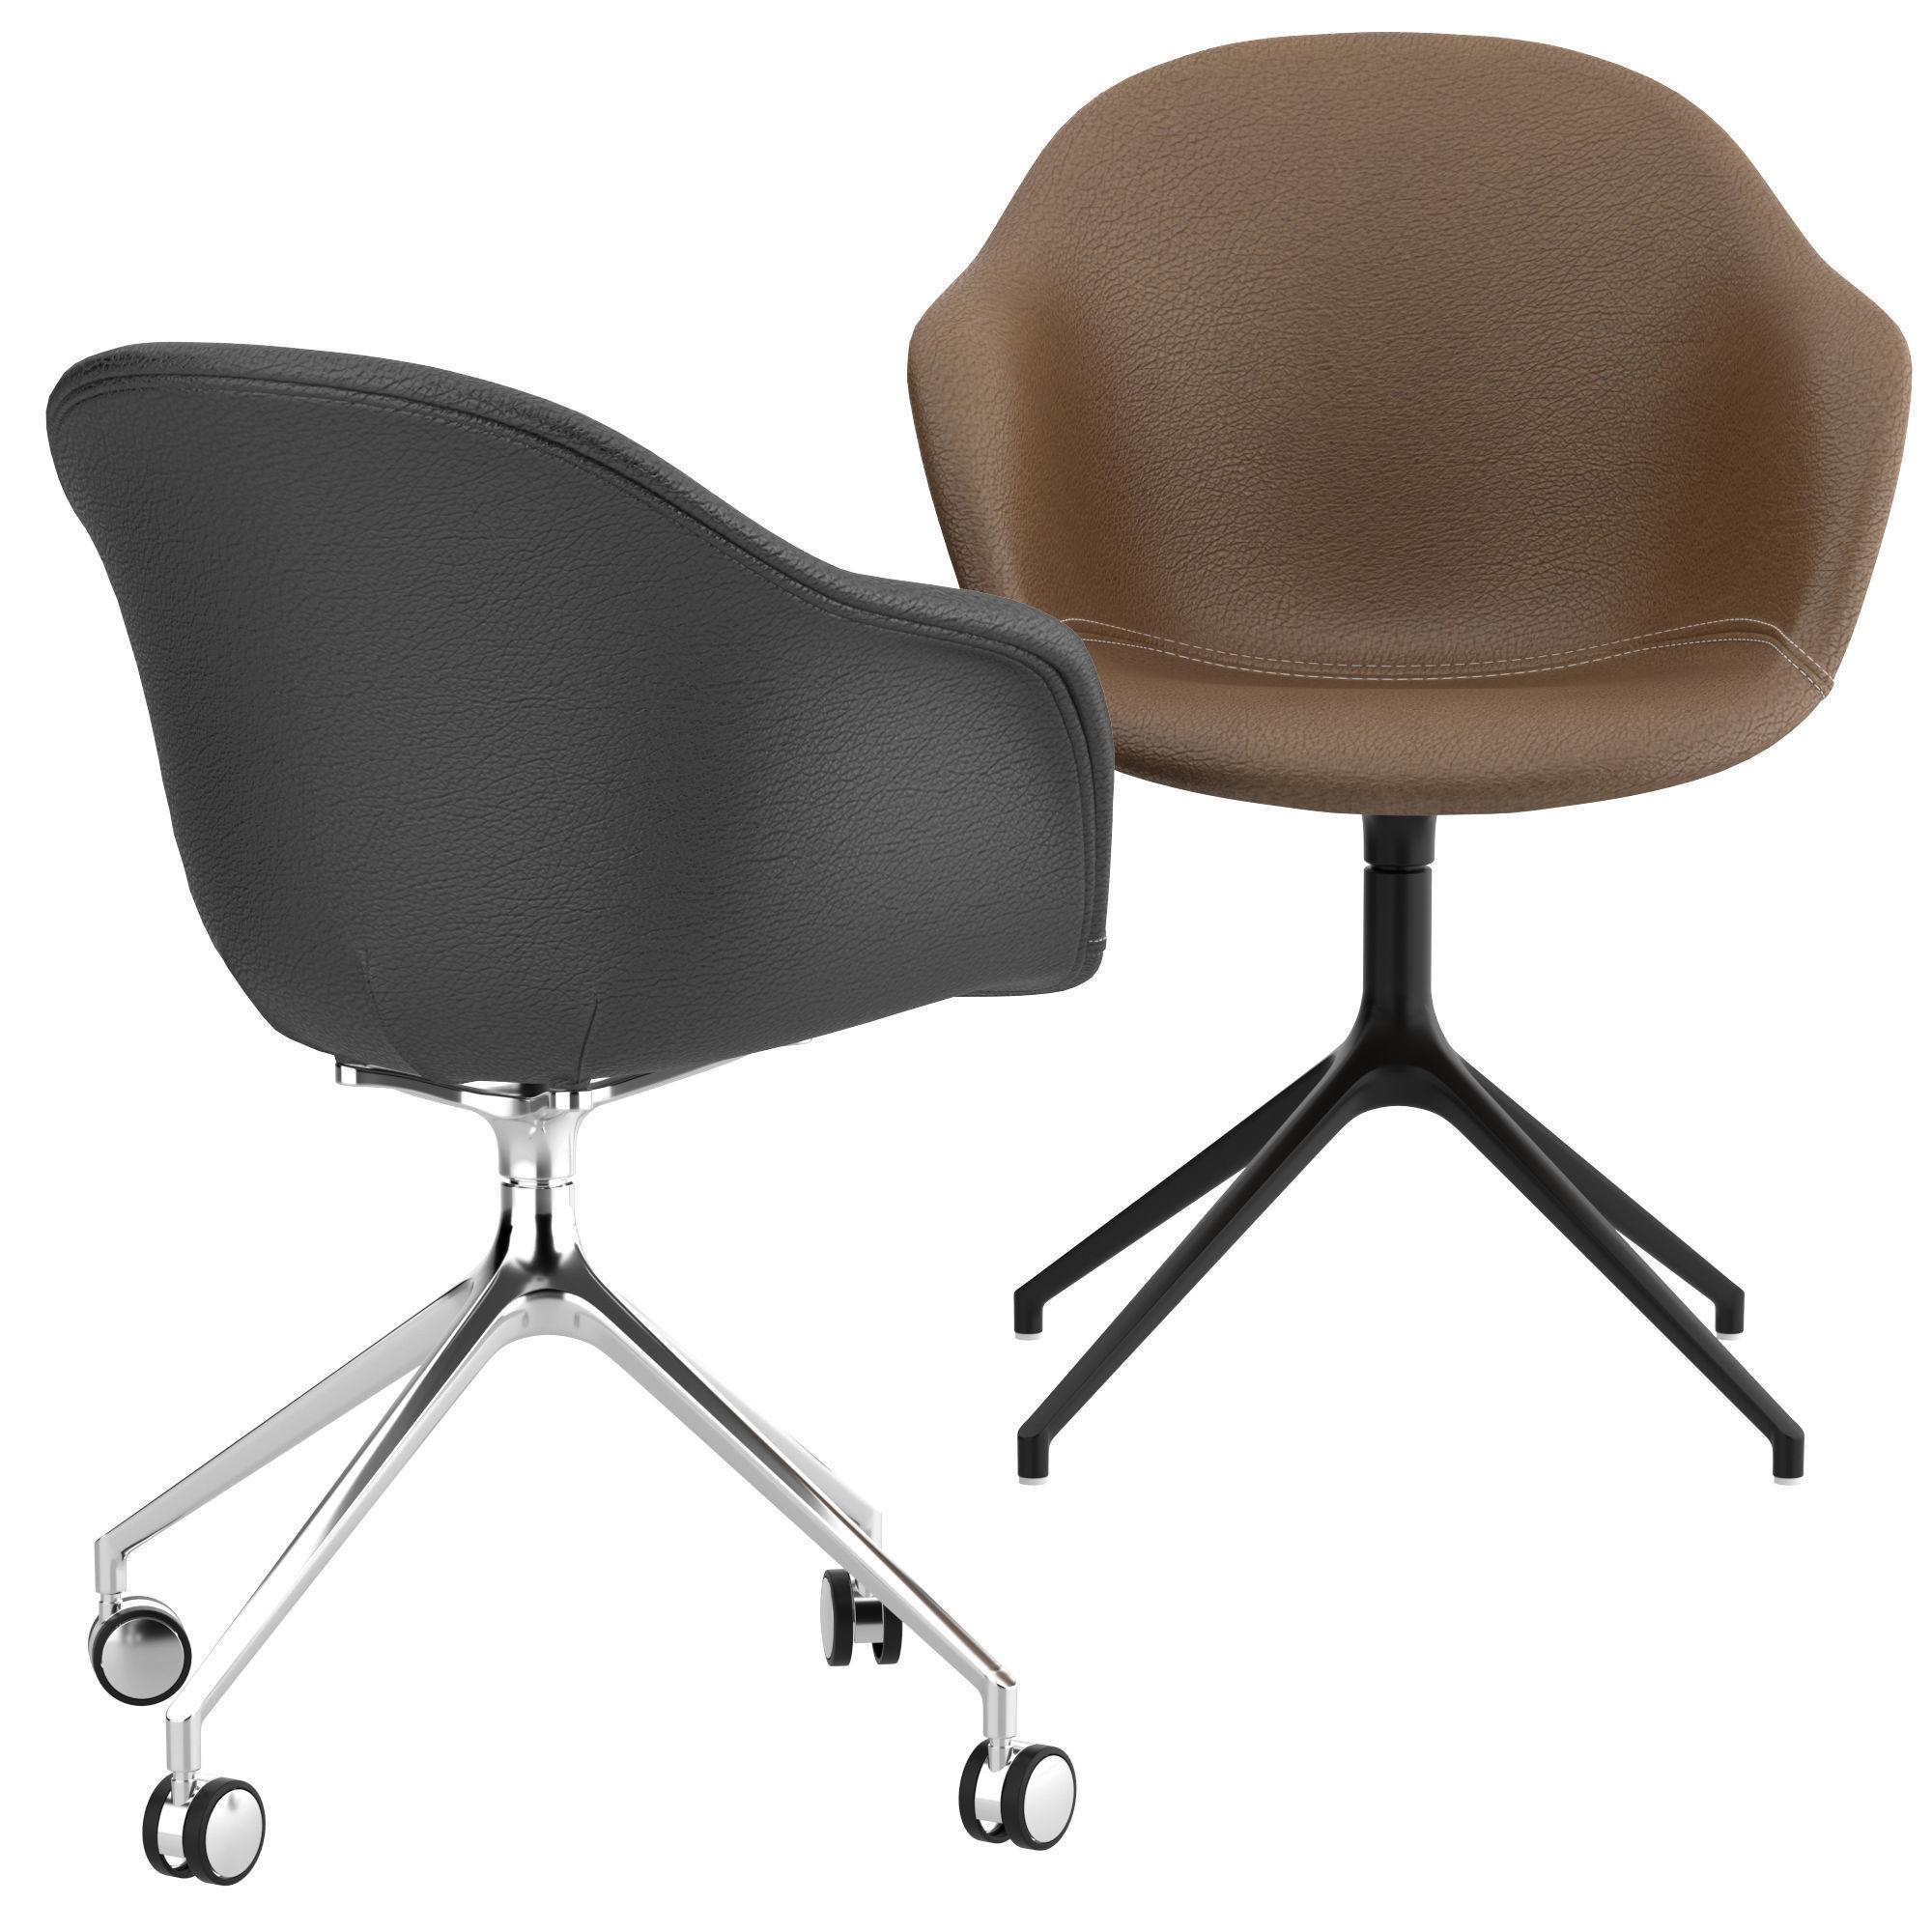 Boconcept-adelaide chair